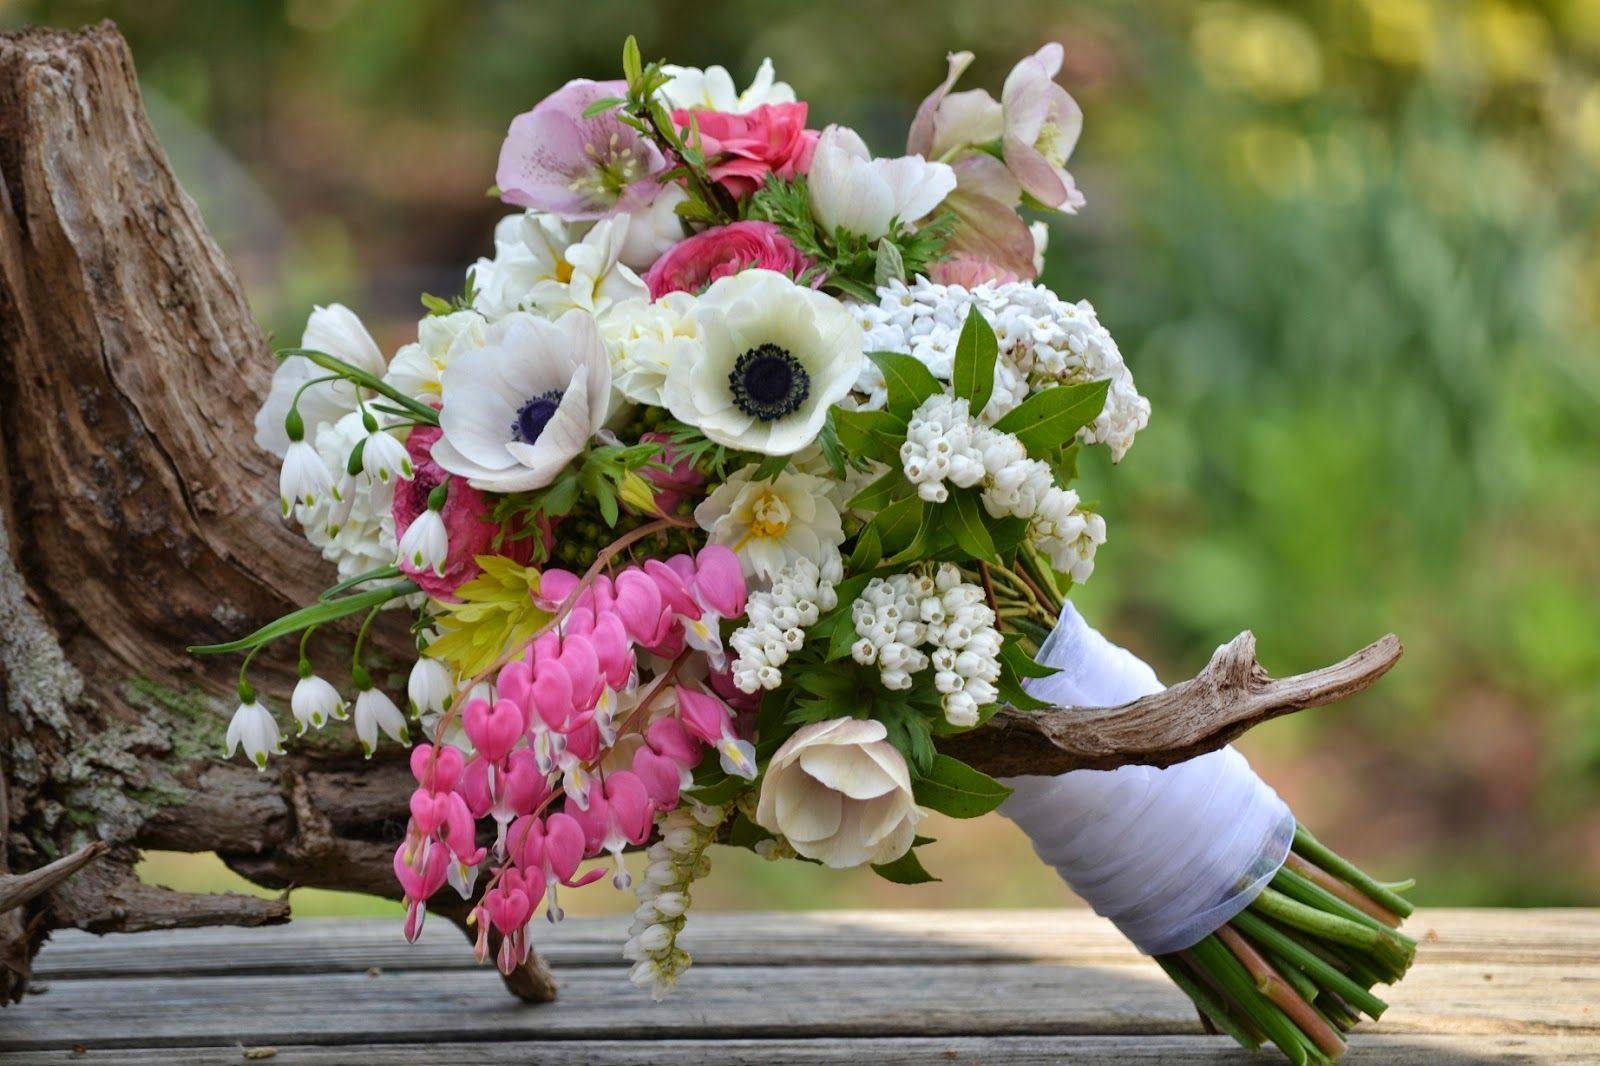 Romantic Bleeding Heart for April Bridal Bouquet Wedding